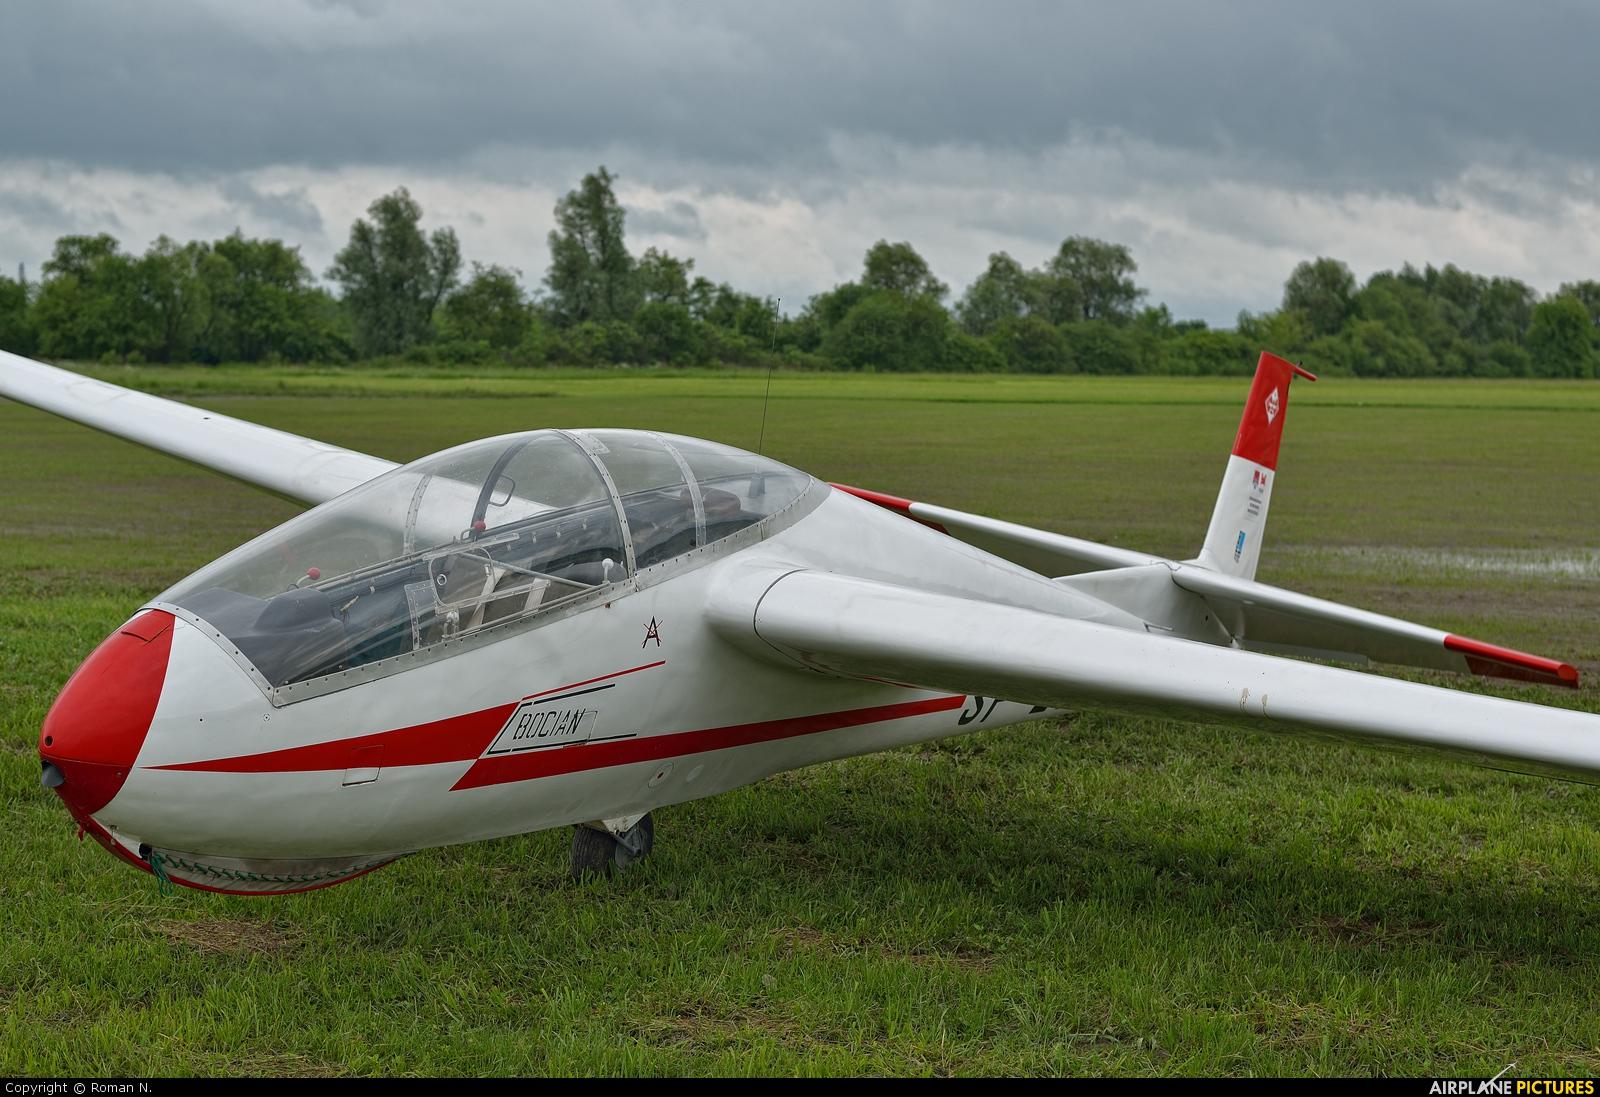 Aeroklub Ziemi Mazowieckiej SP-2812 aircraft at Płock